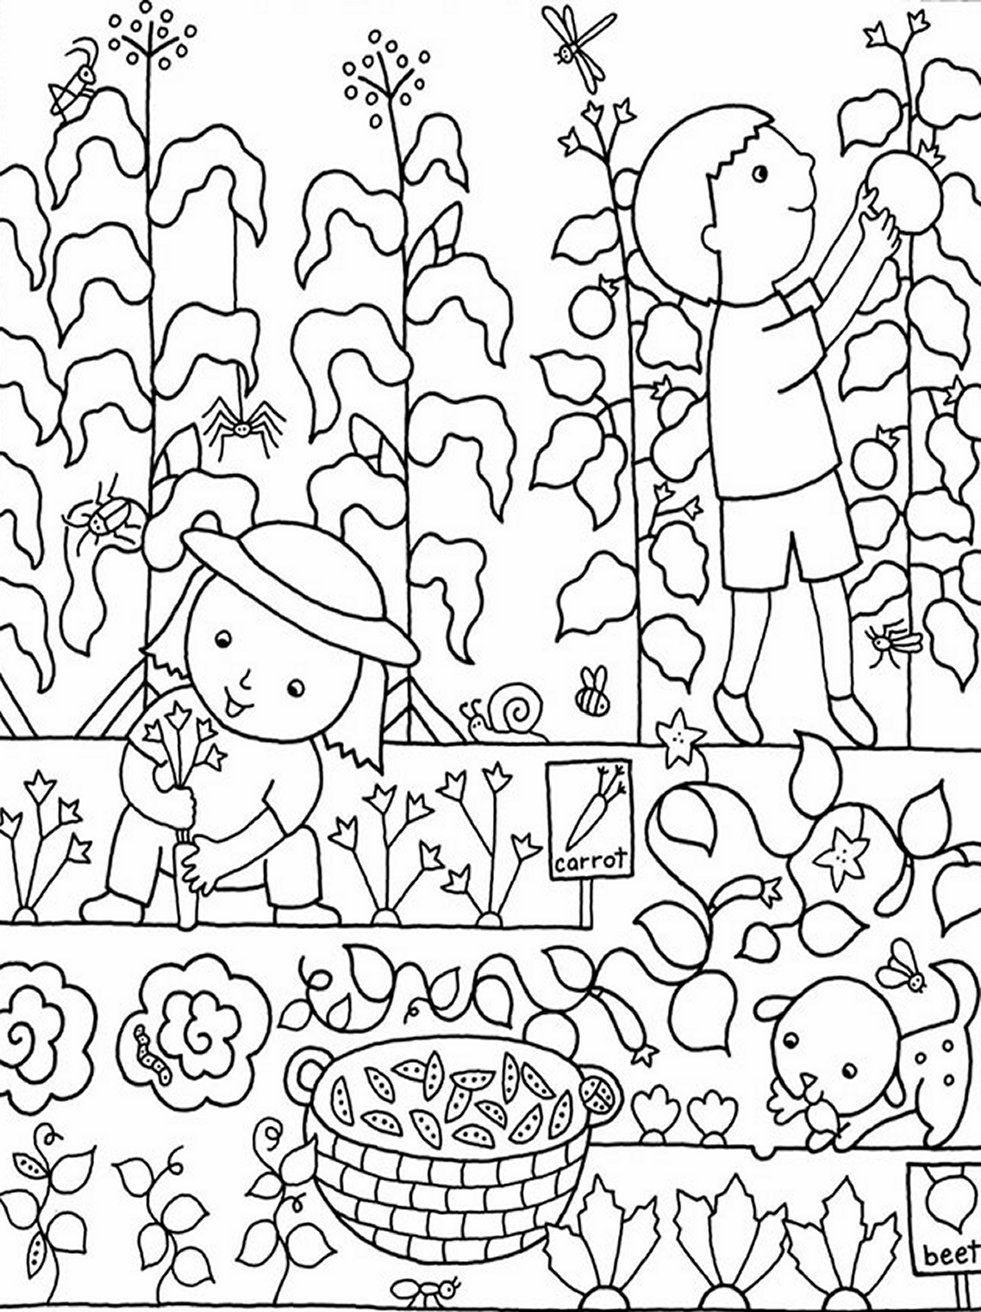 garden coloring pages printable kids gardening coloring pages free colouring pictures to pages coloring printable garden